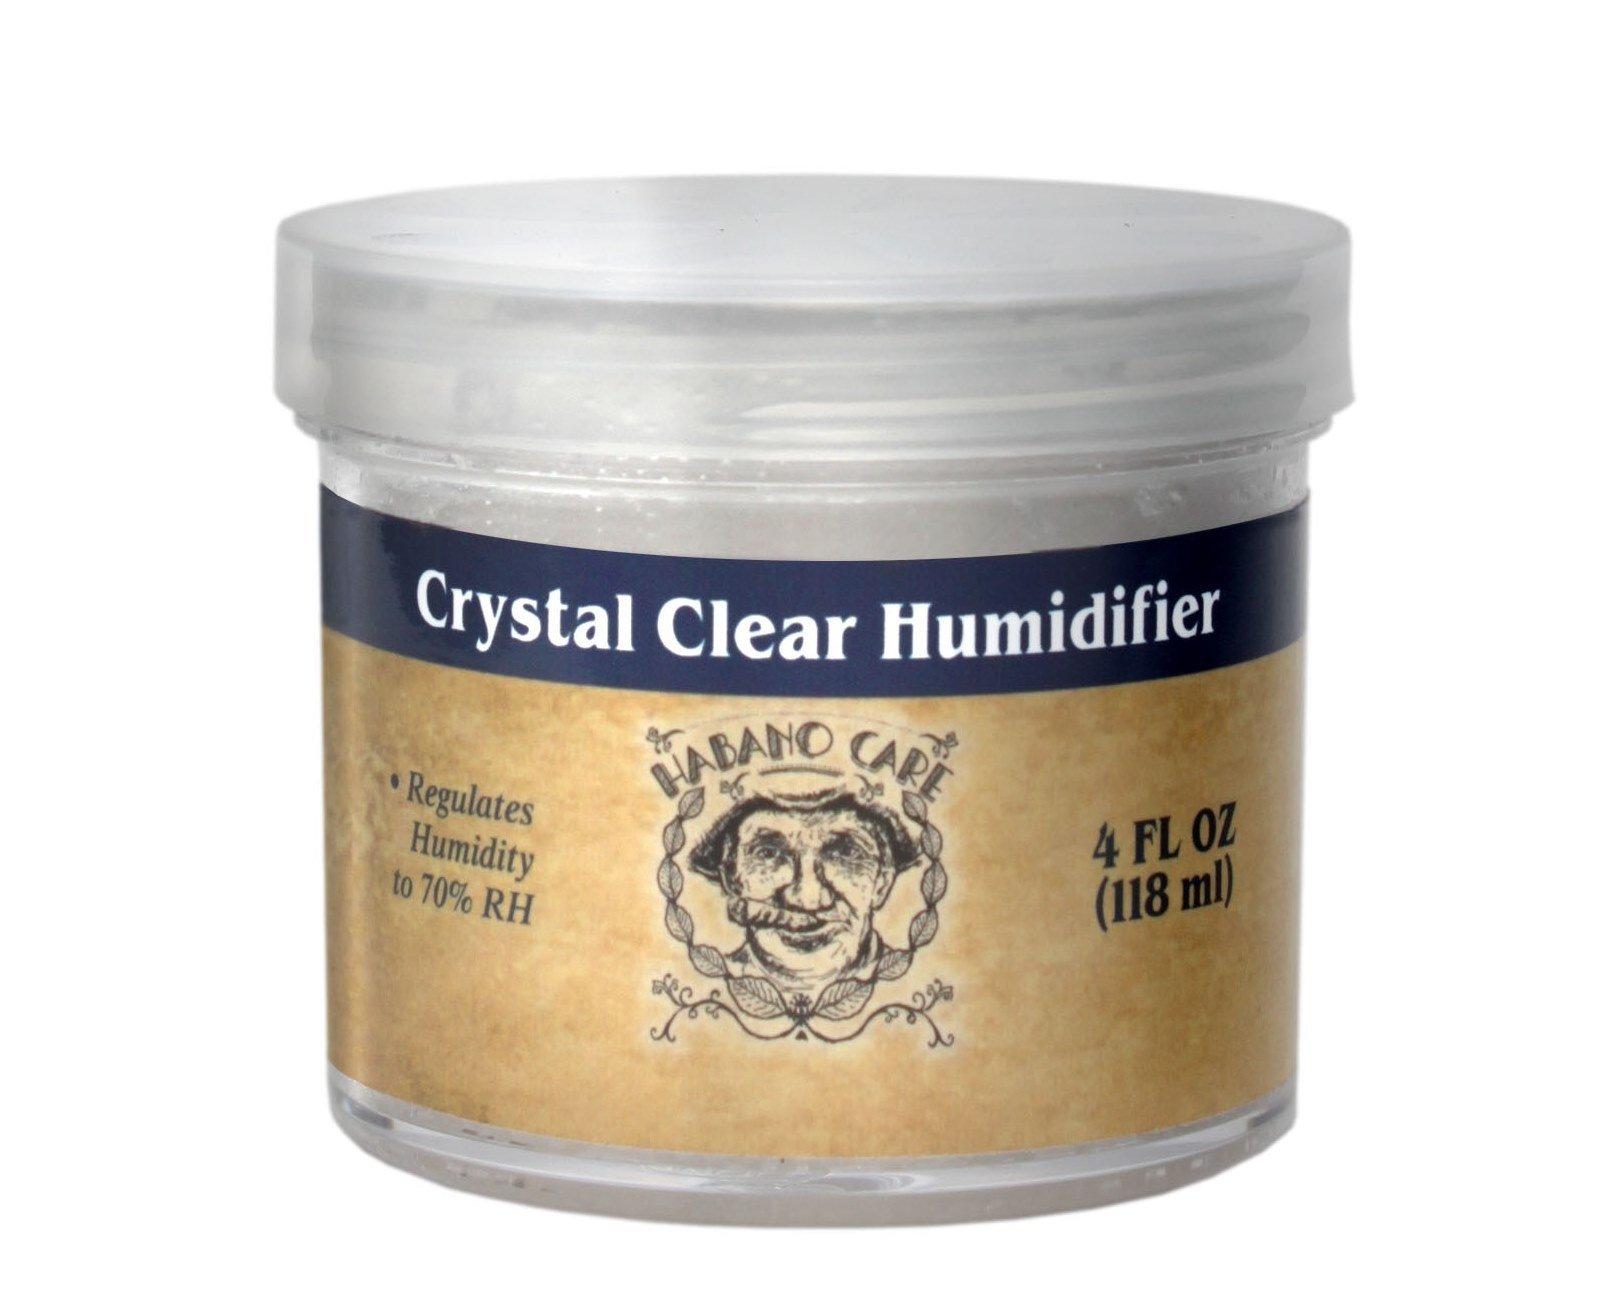 Habano Care - Premium Crystal Clear Cigar Humidor Humidifier Jar 4 oz Gel Humidification Beads by Habano Care